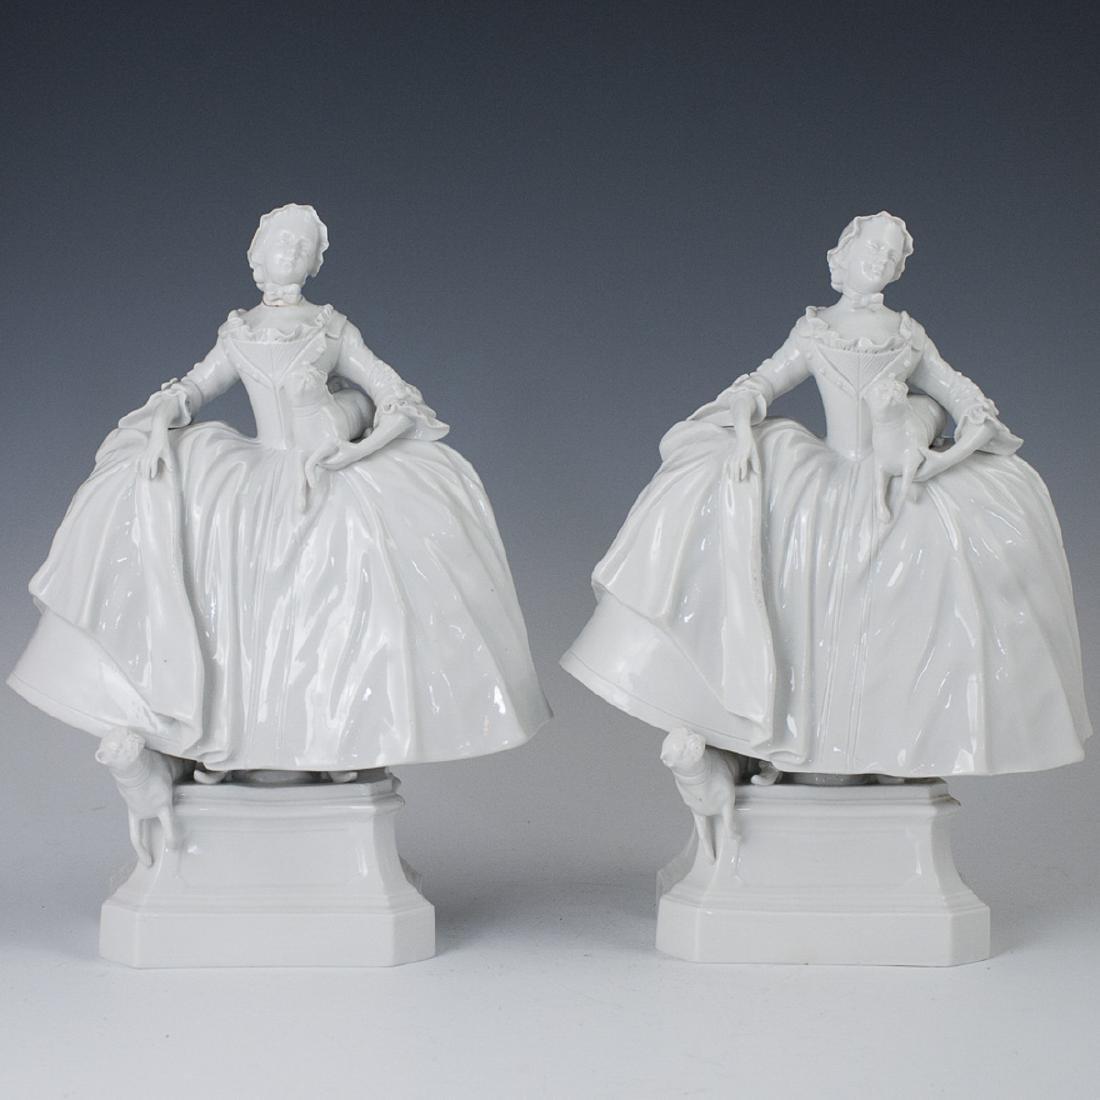 Carl Thieme German Porcelain Figurines